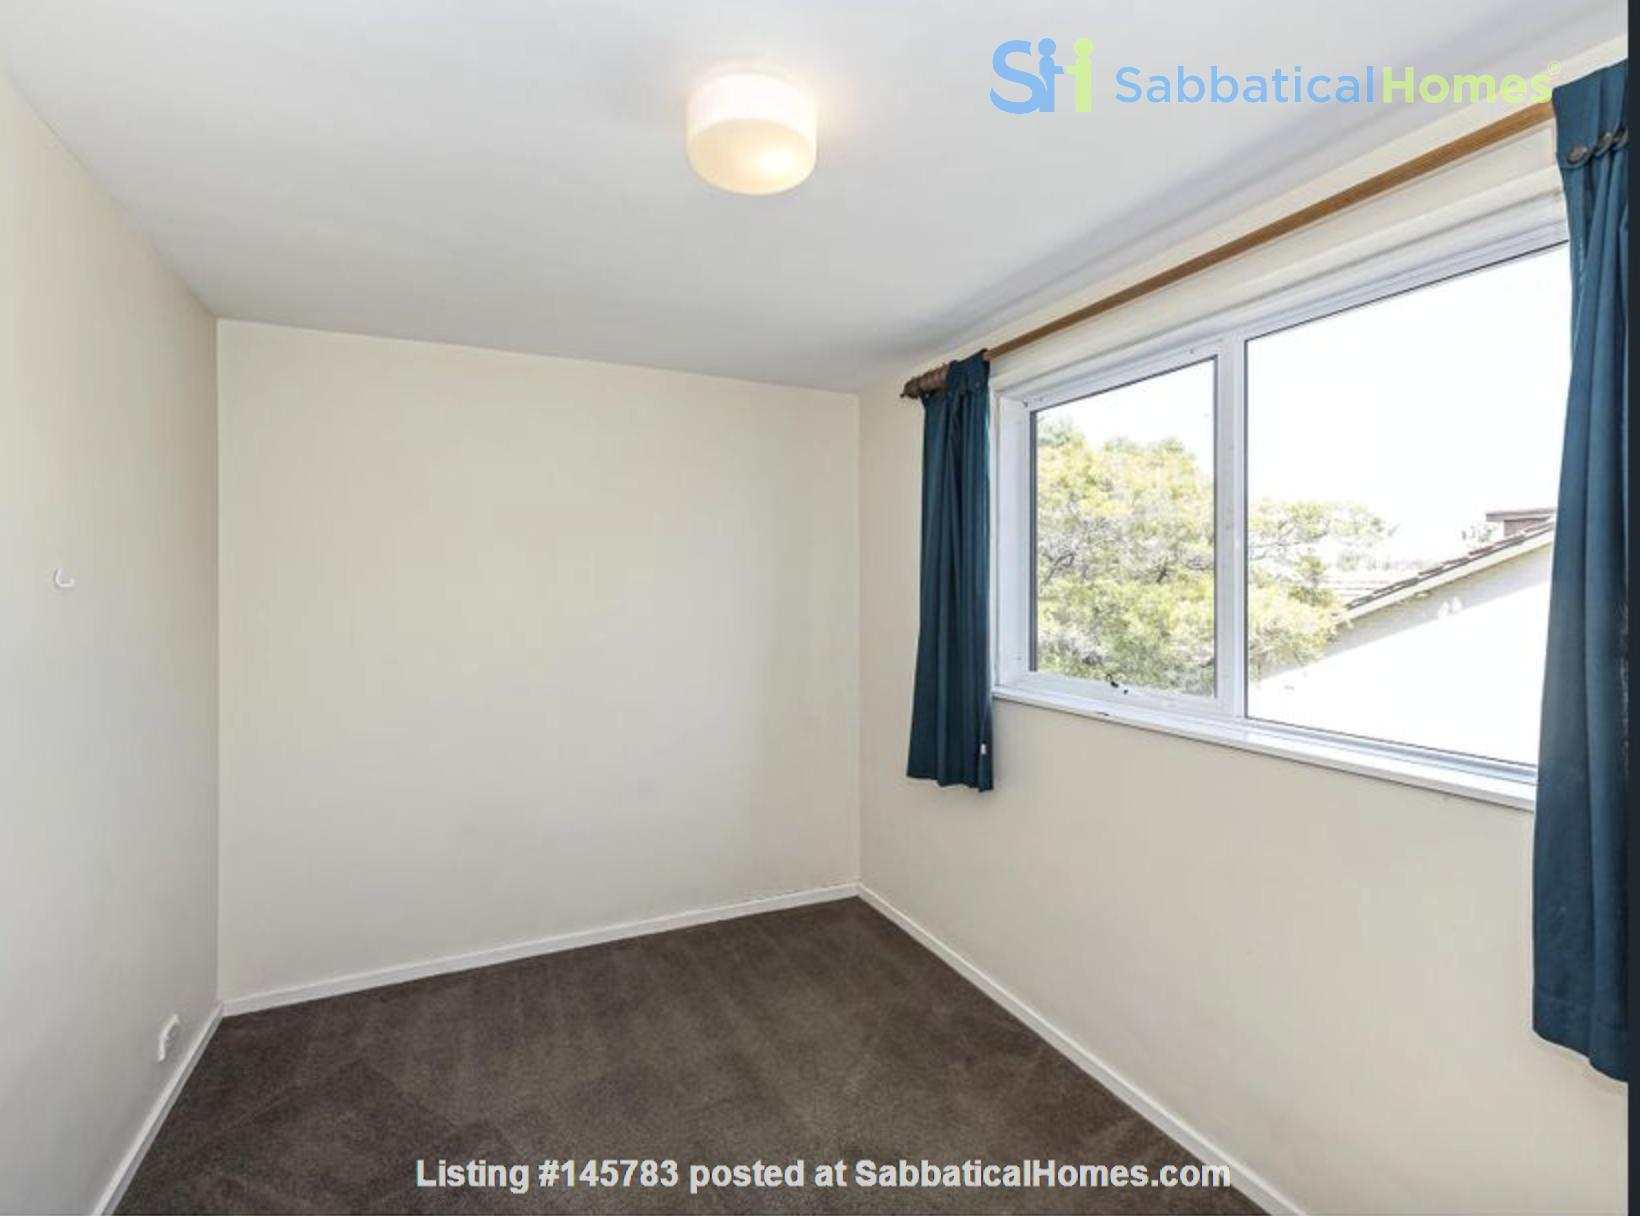 2 bedroom apartment in inner city Melbourne Home Rental in St Kilda East 5